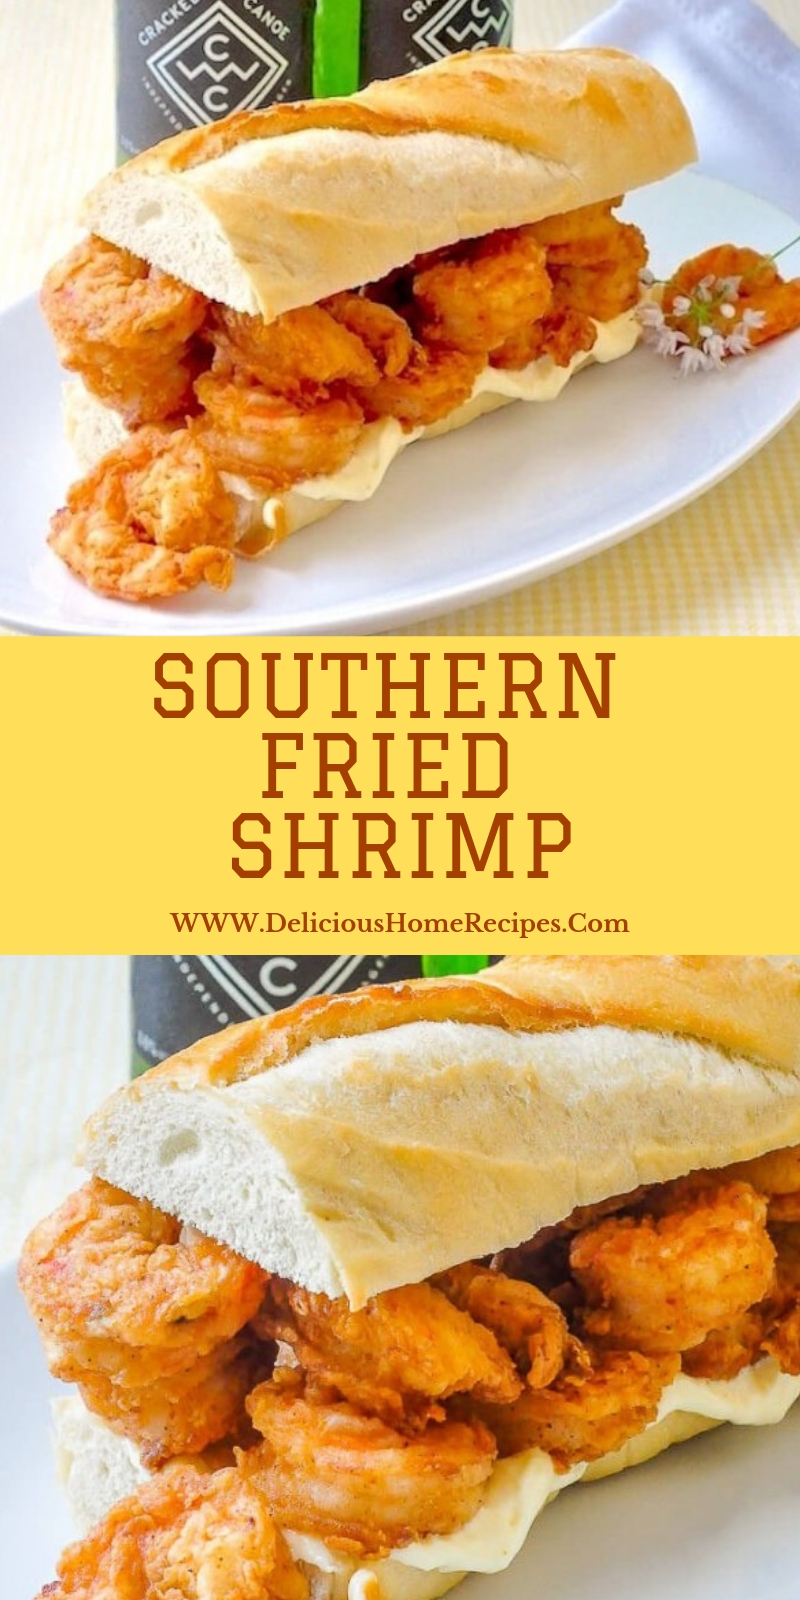 Southern Fried Shrimp